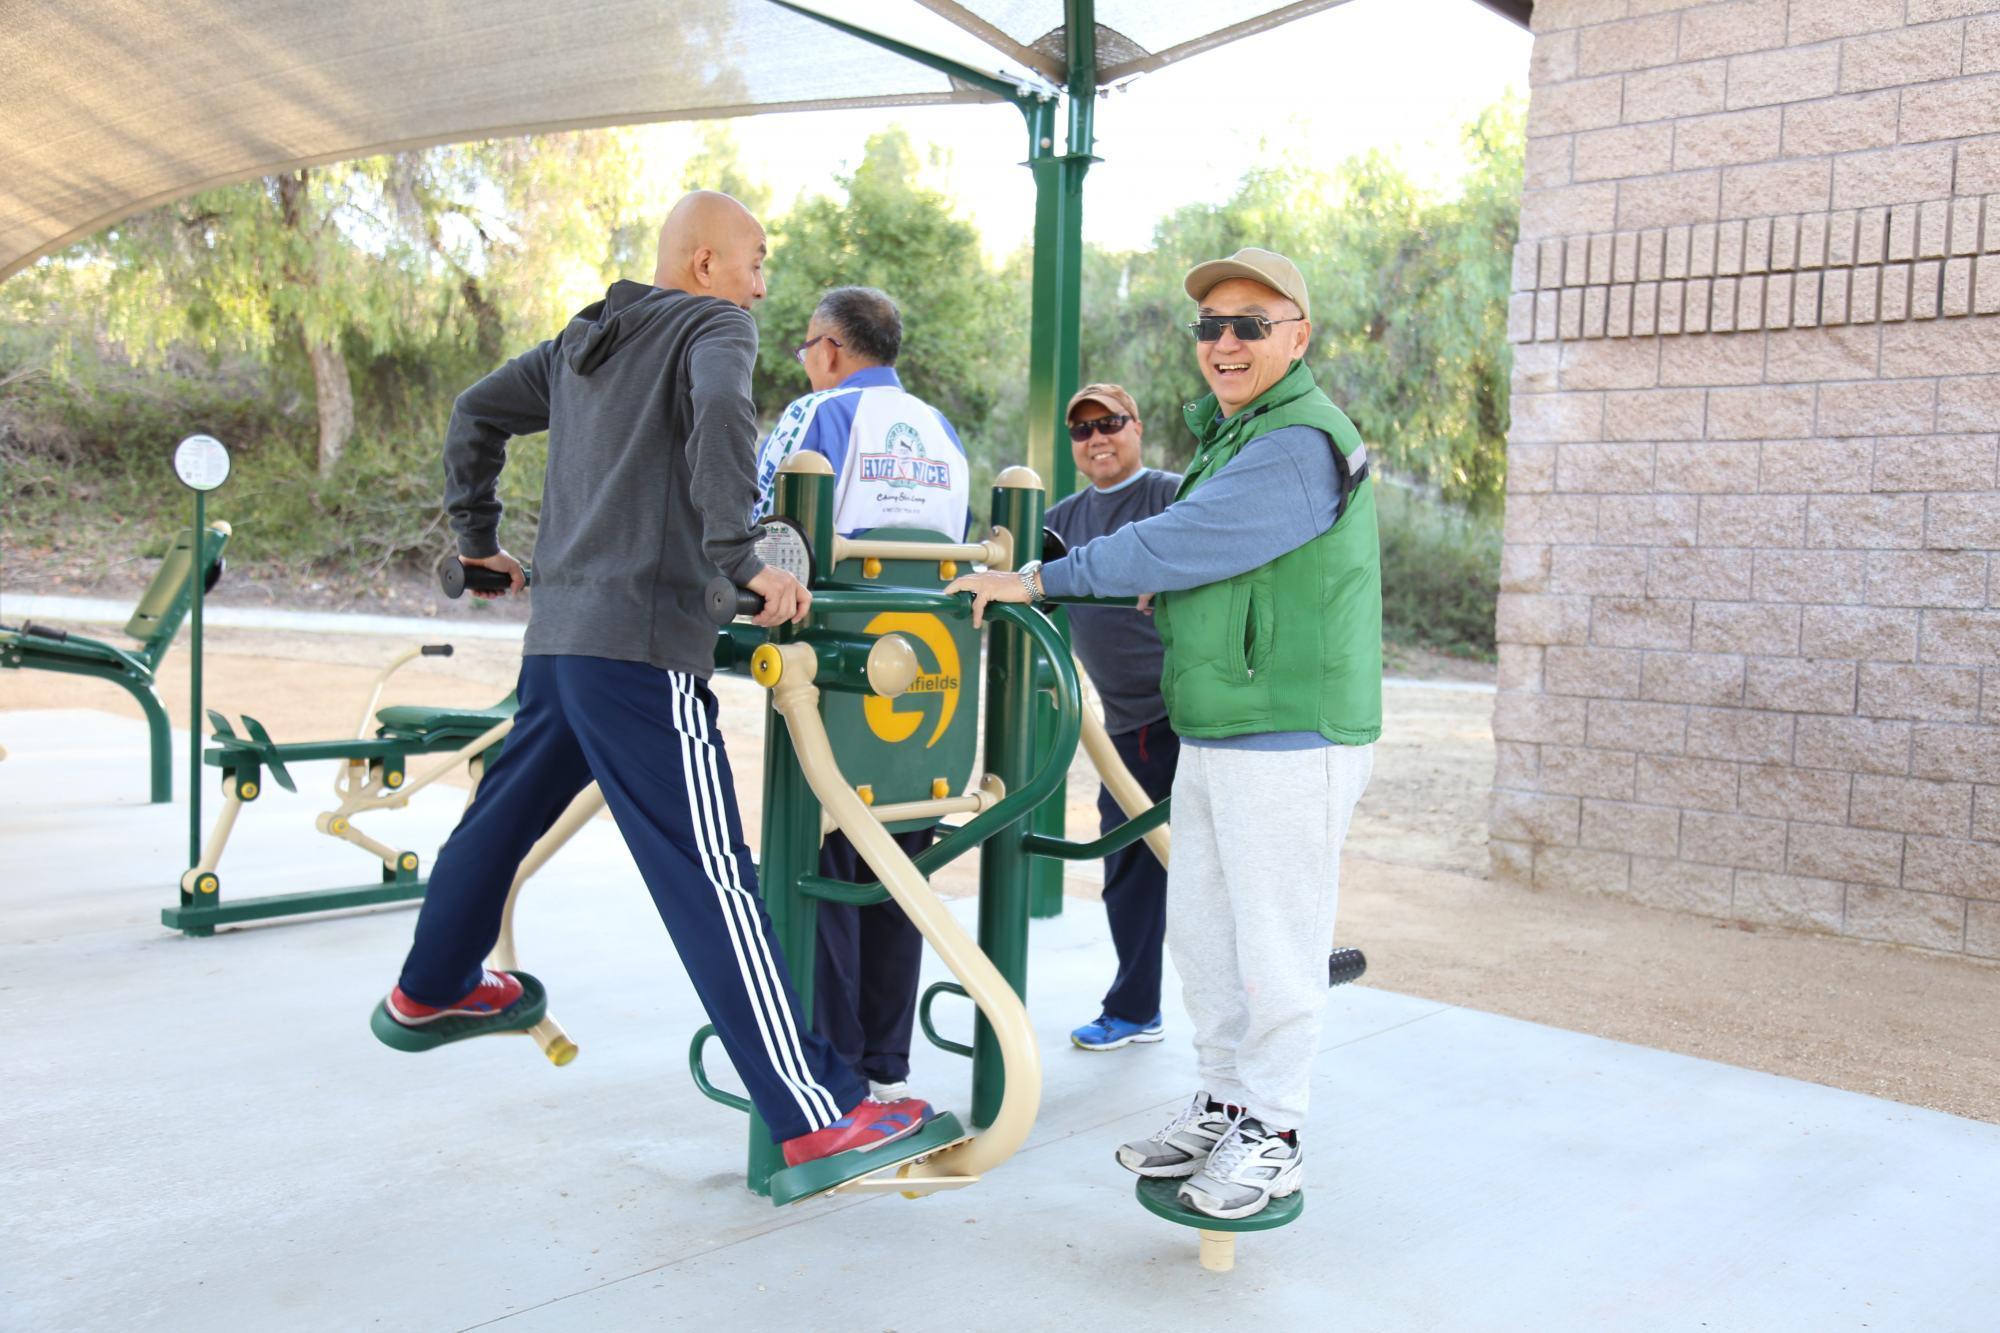 Seniors using outdoor fitness equipment